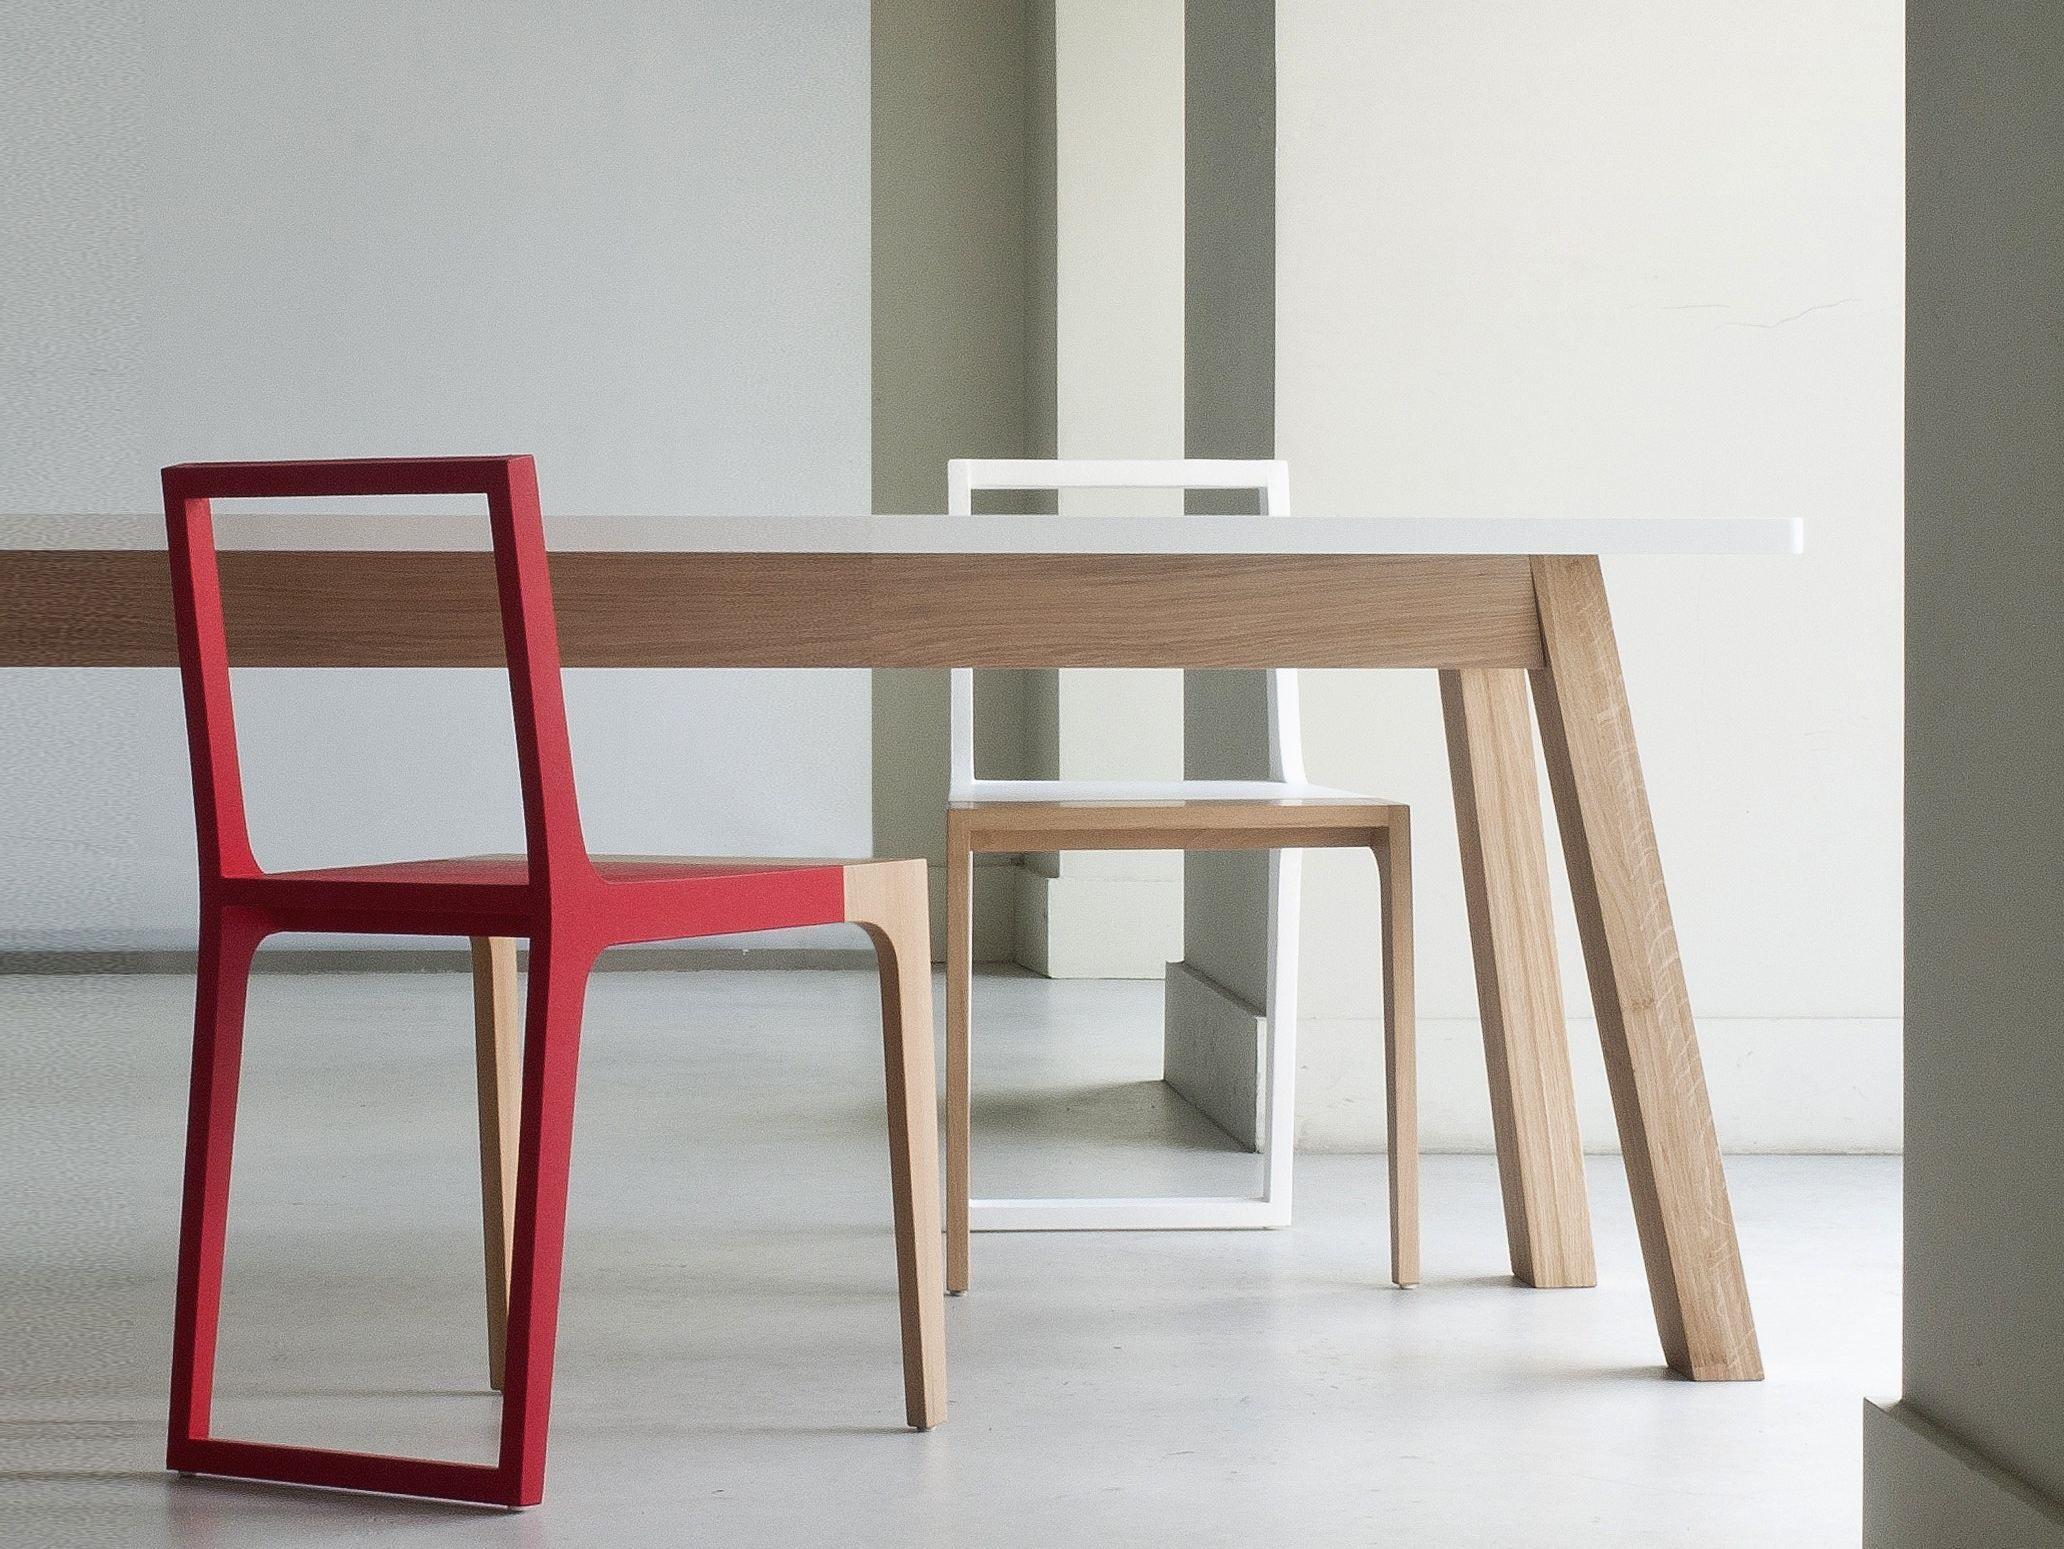 Esstisch Aus Massivem Holz STANDARD By Branca Lisboa | Design Marco Sousa  Santos